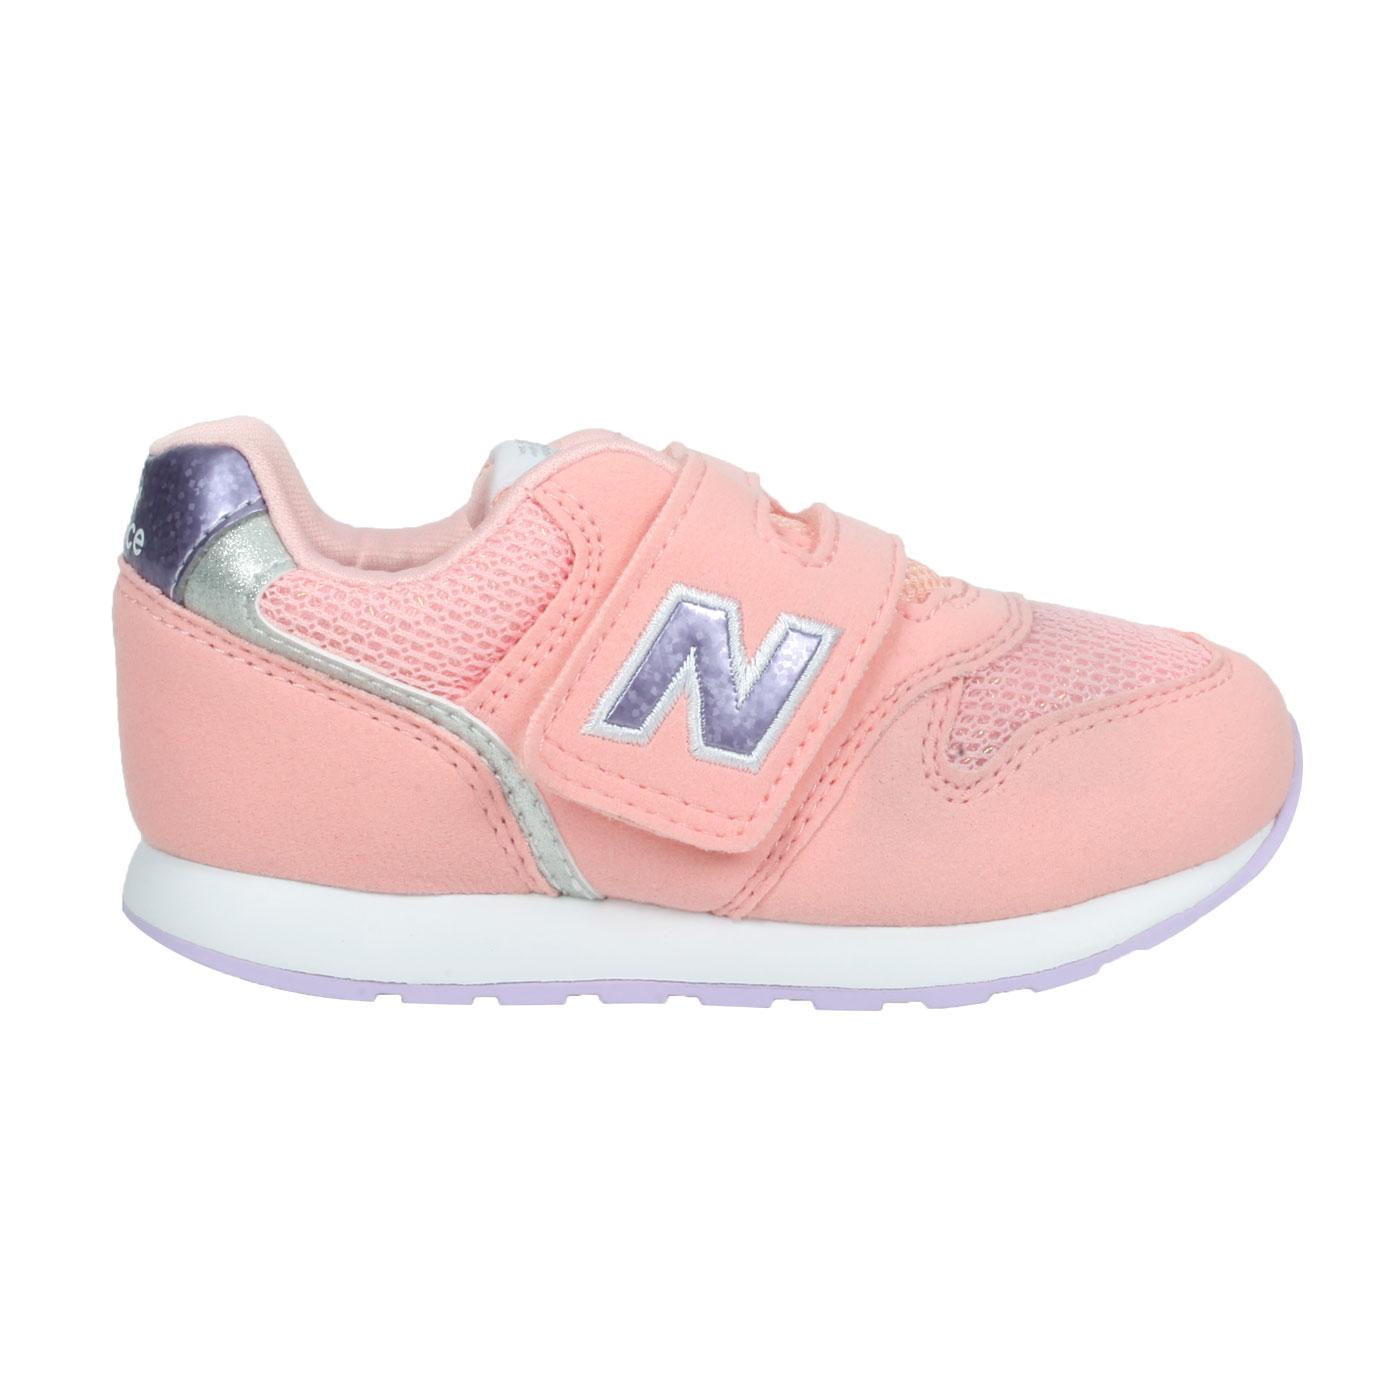 NEW BALANCE 小童休閒運動鞋-WIDE IZ996UPN - 粉橘紫